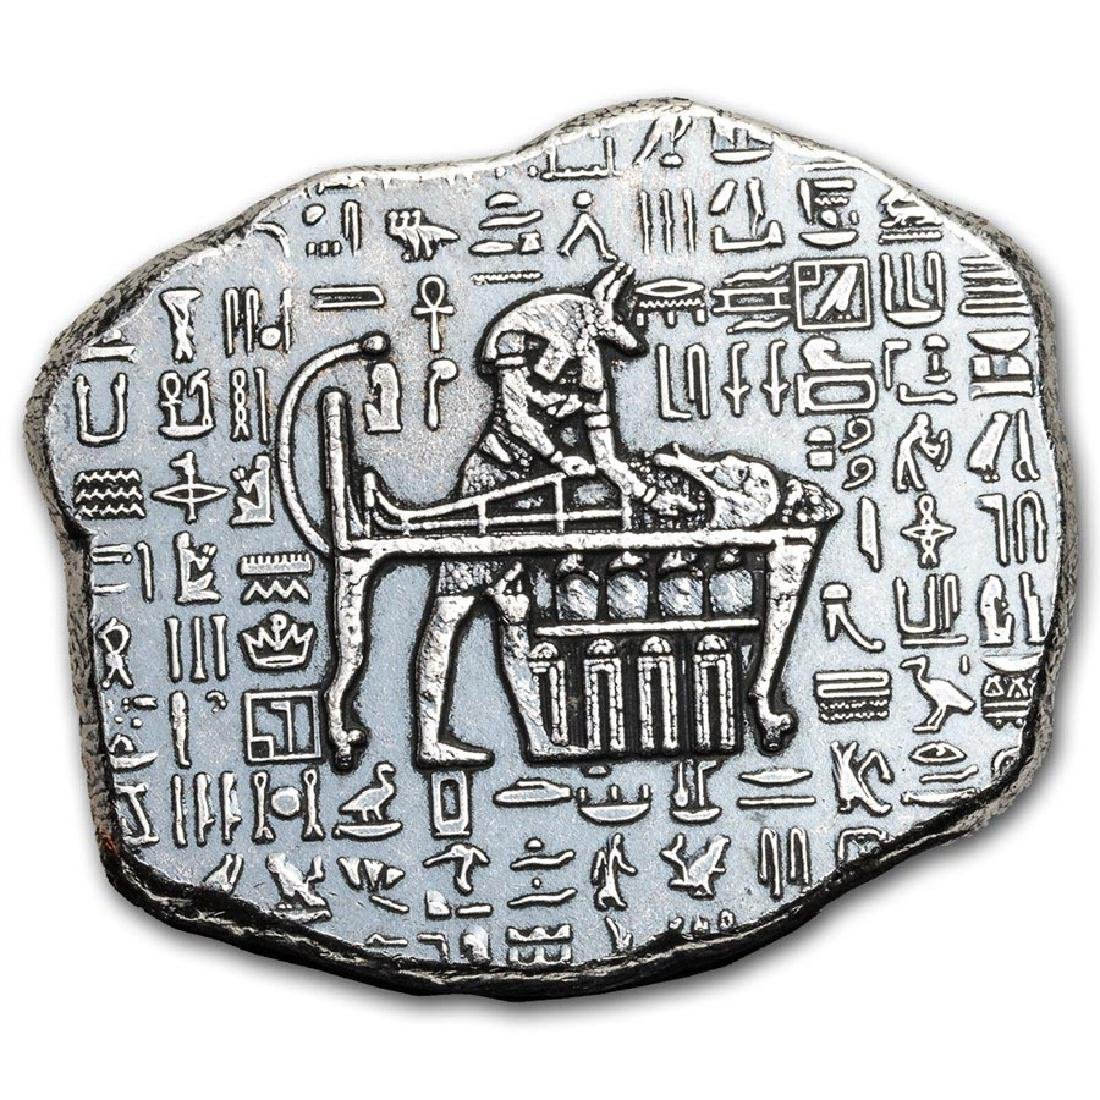 1 oz Silver Relic Bar - Monarch Precious Metals (Anubis